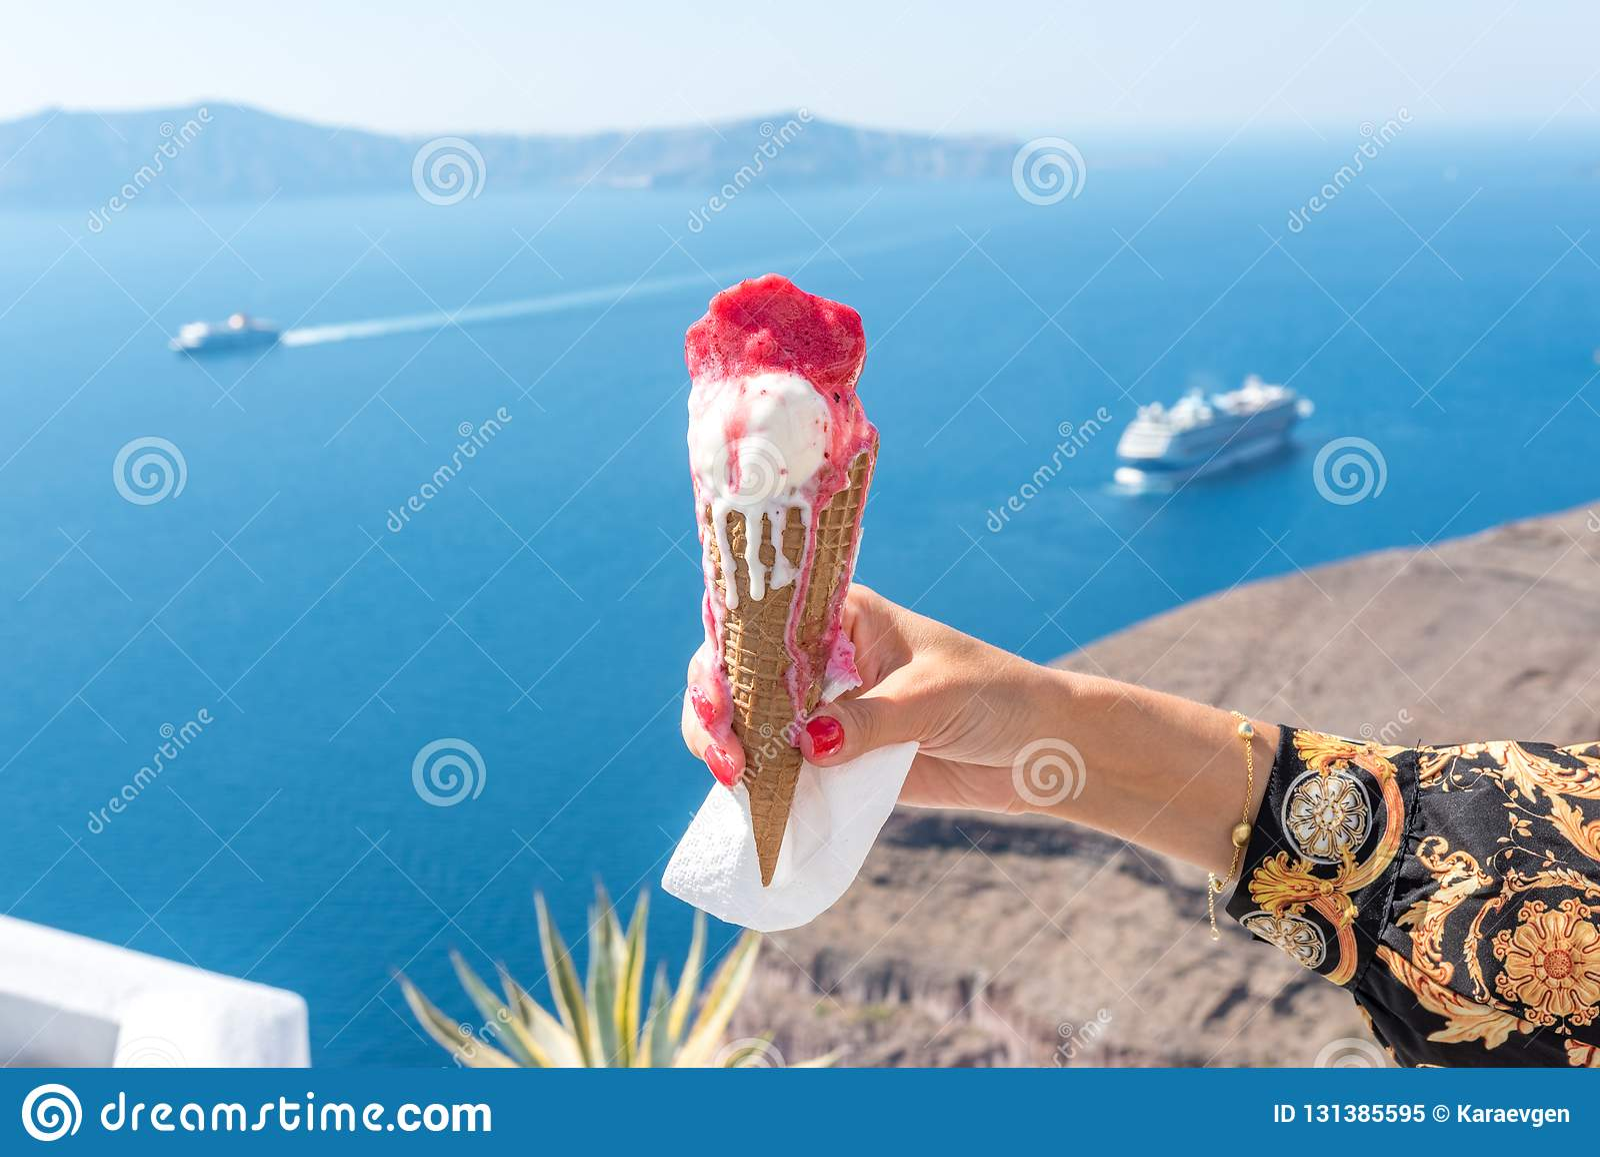 Ice cream in a waffle cone in woman`s hand on background of Santorini island and Caldera in Aegean sea.